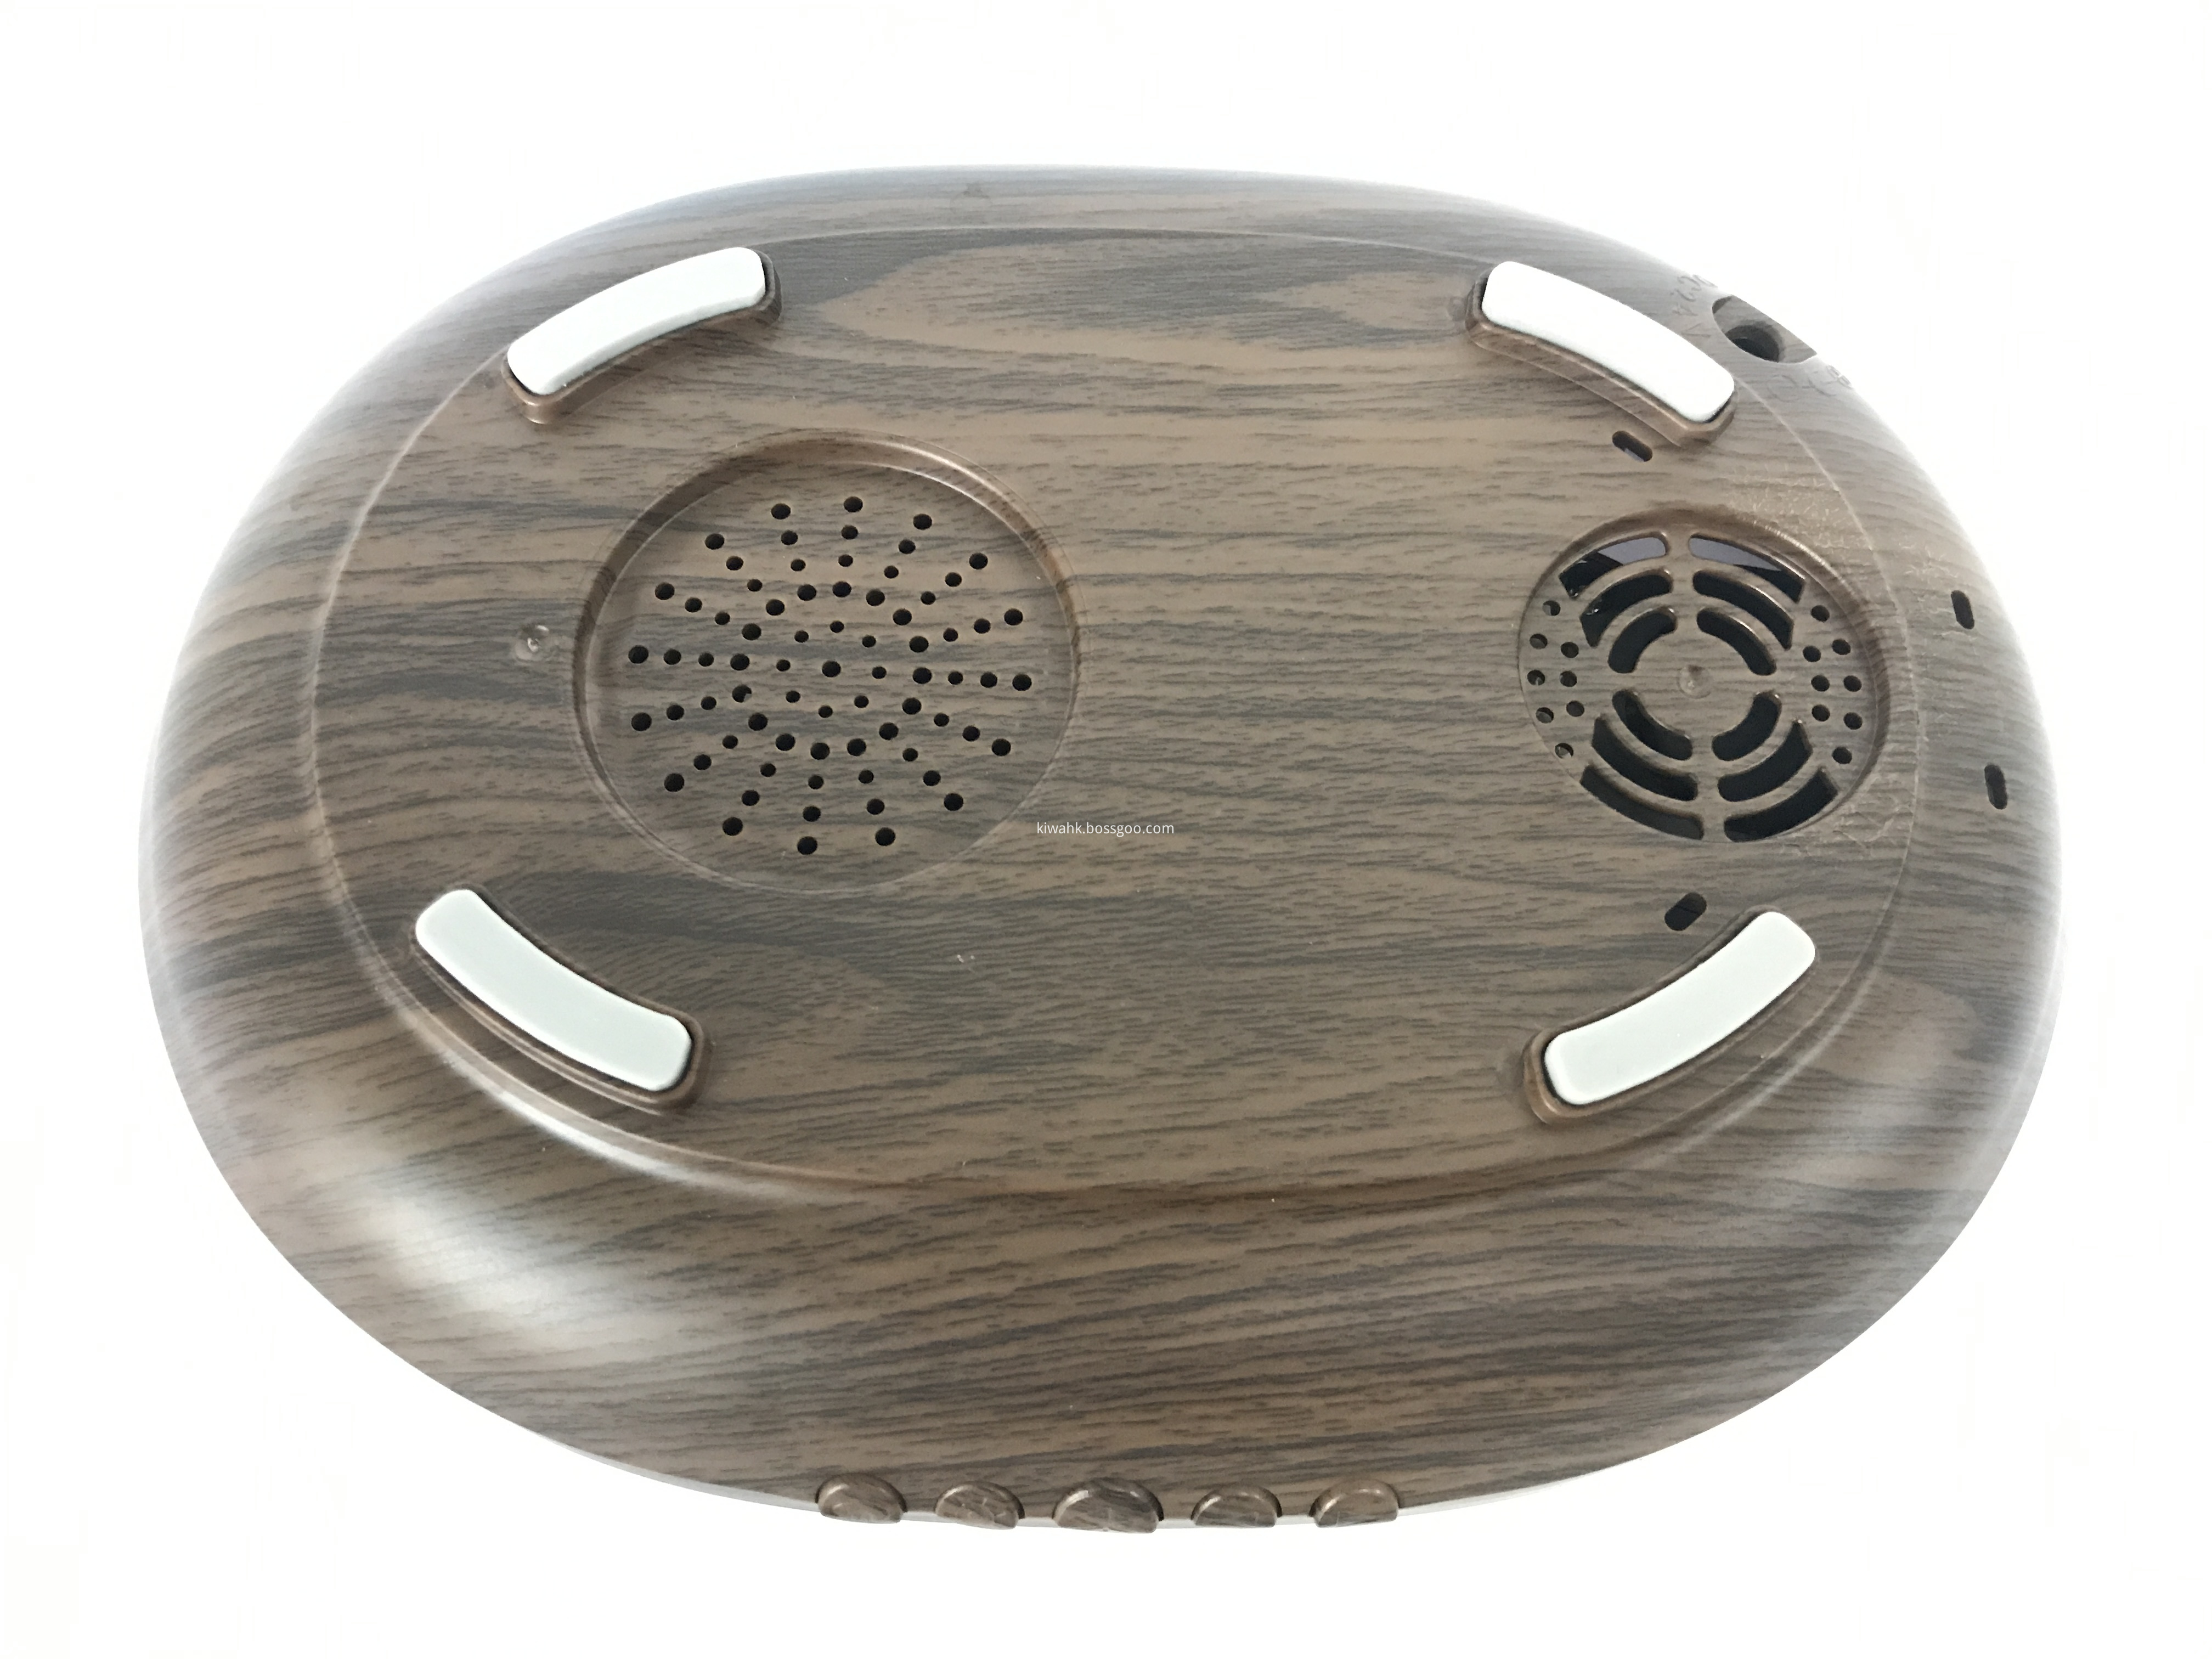 Ultrasonic Miniascape Humidifier